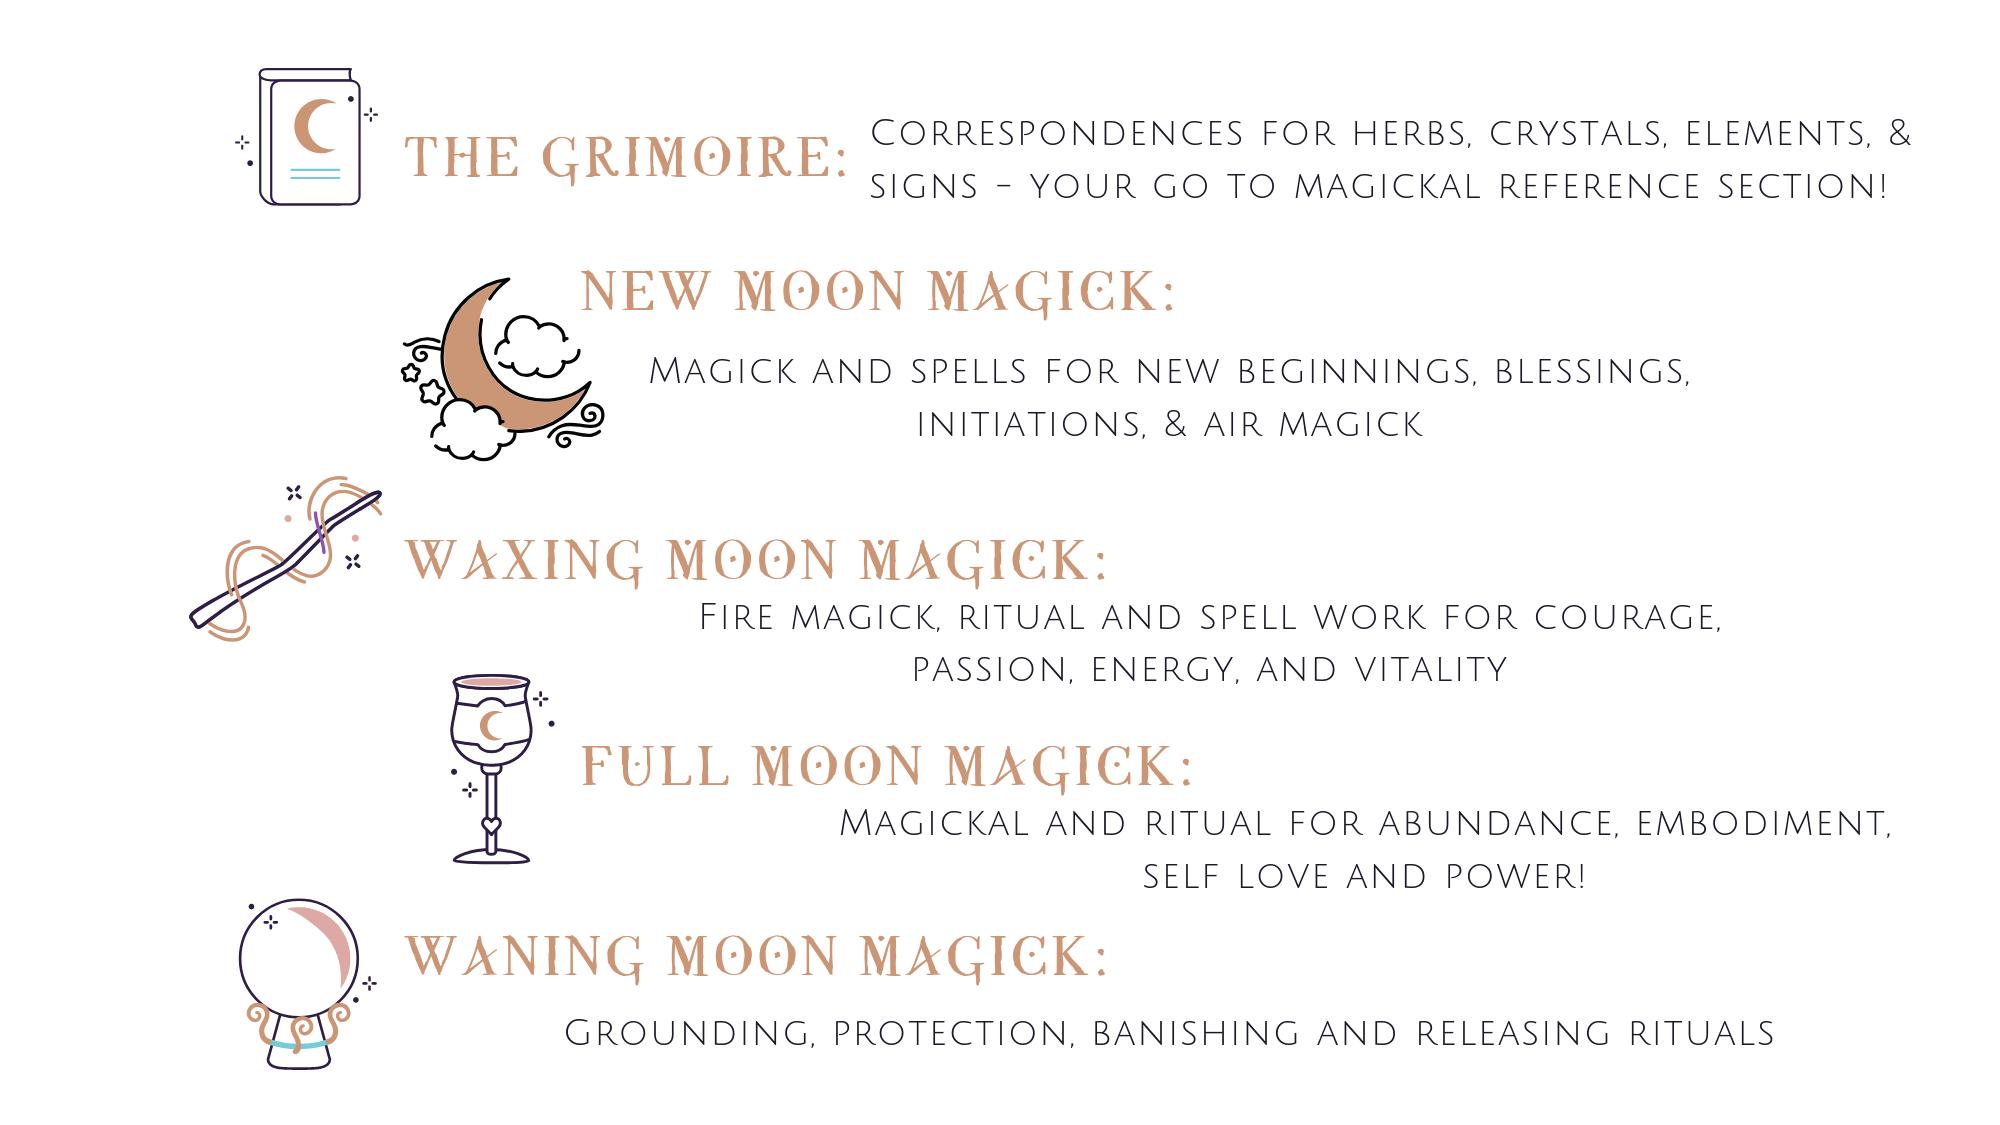 Lunar magick sections